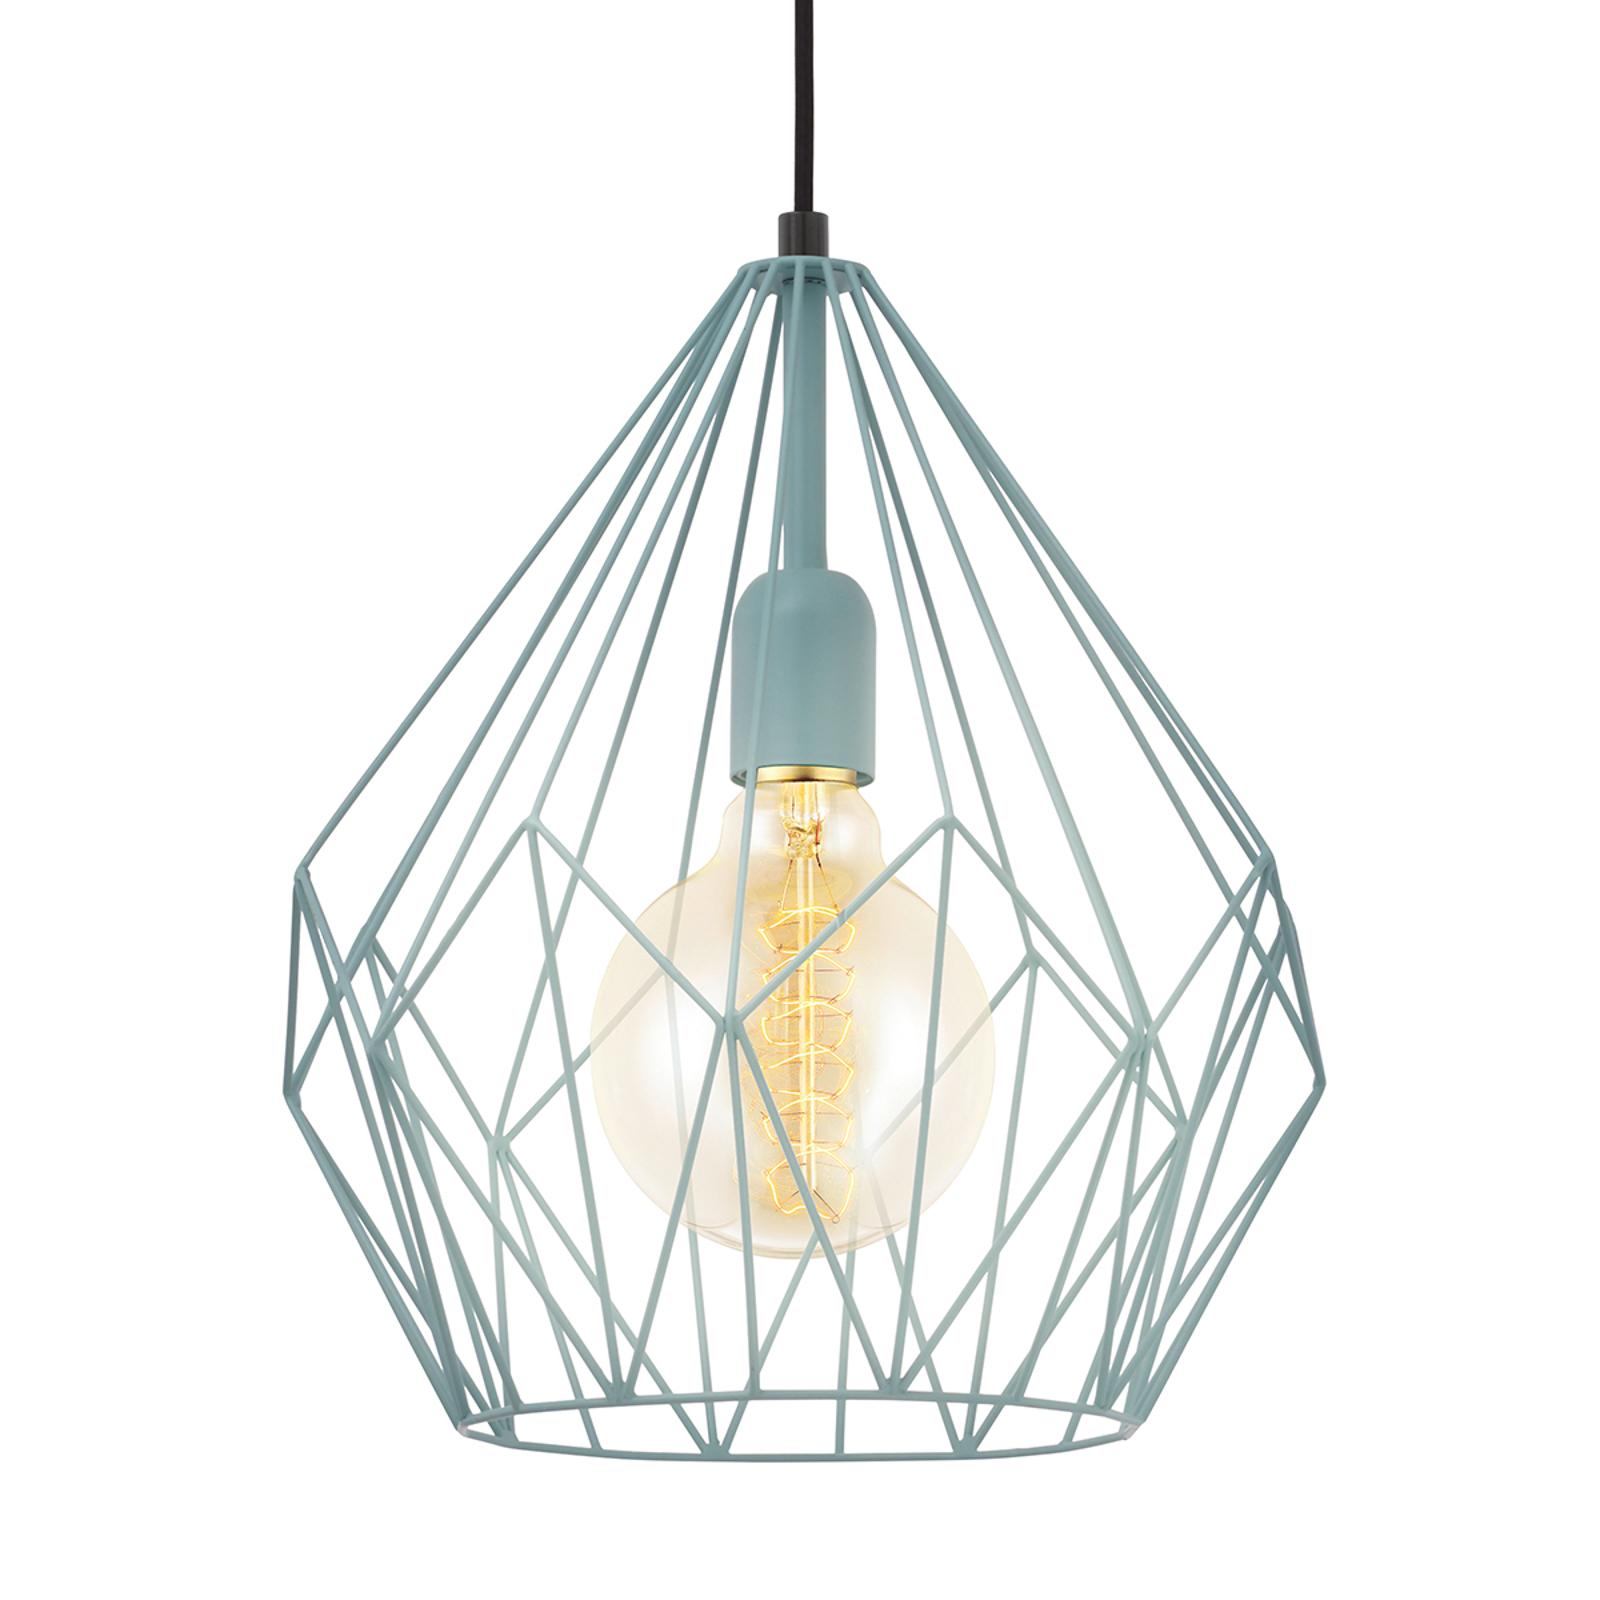 Kolor mięty, lampa wisząca Carlton w stylu vintage